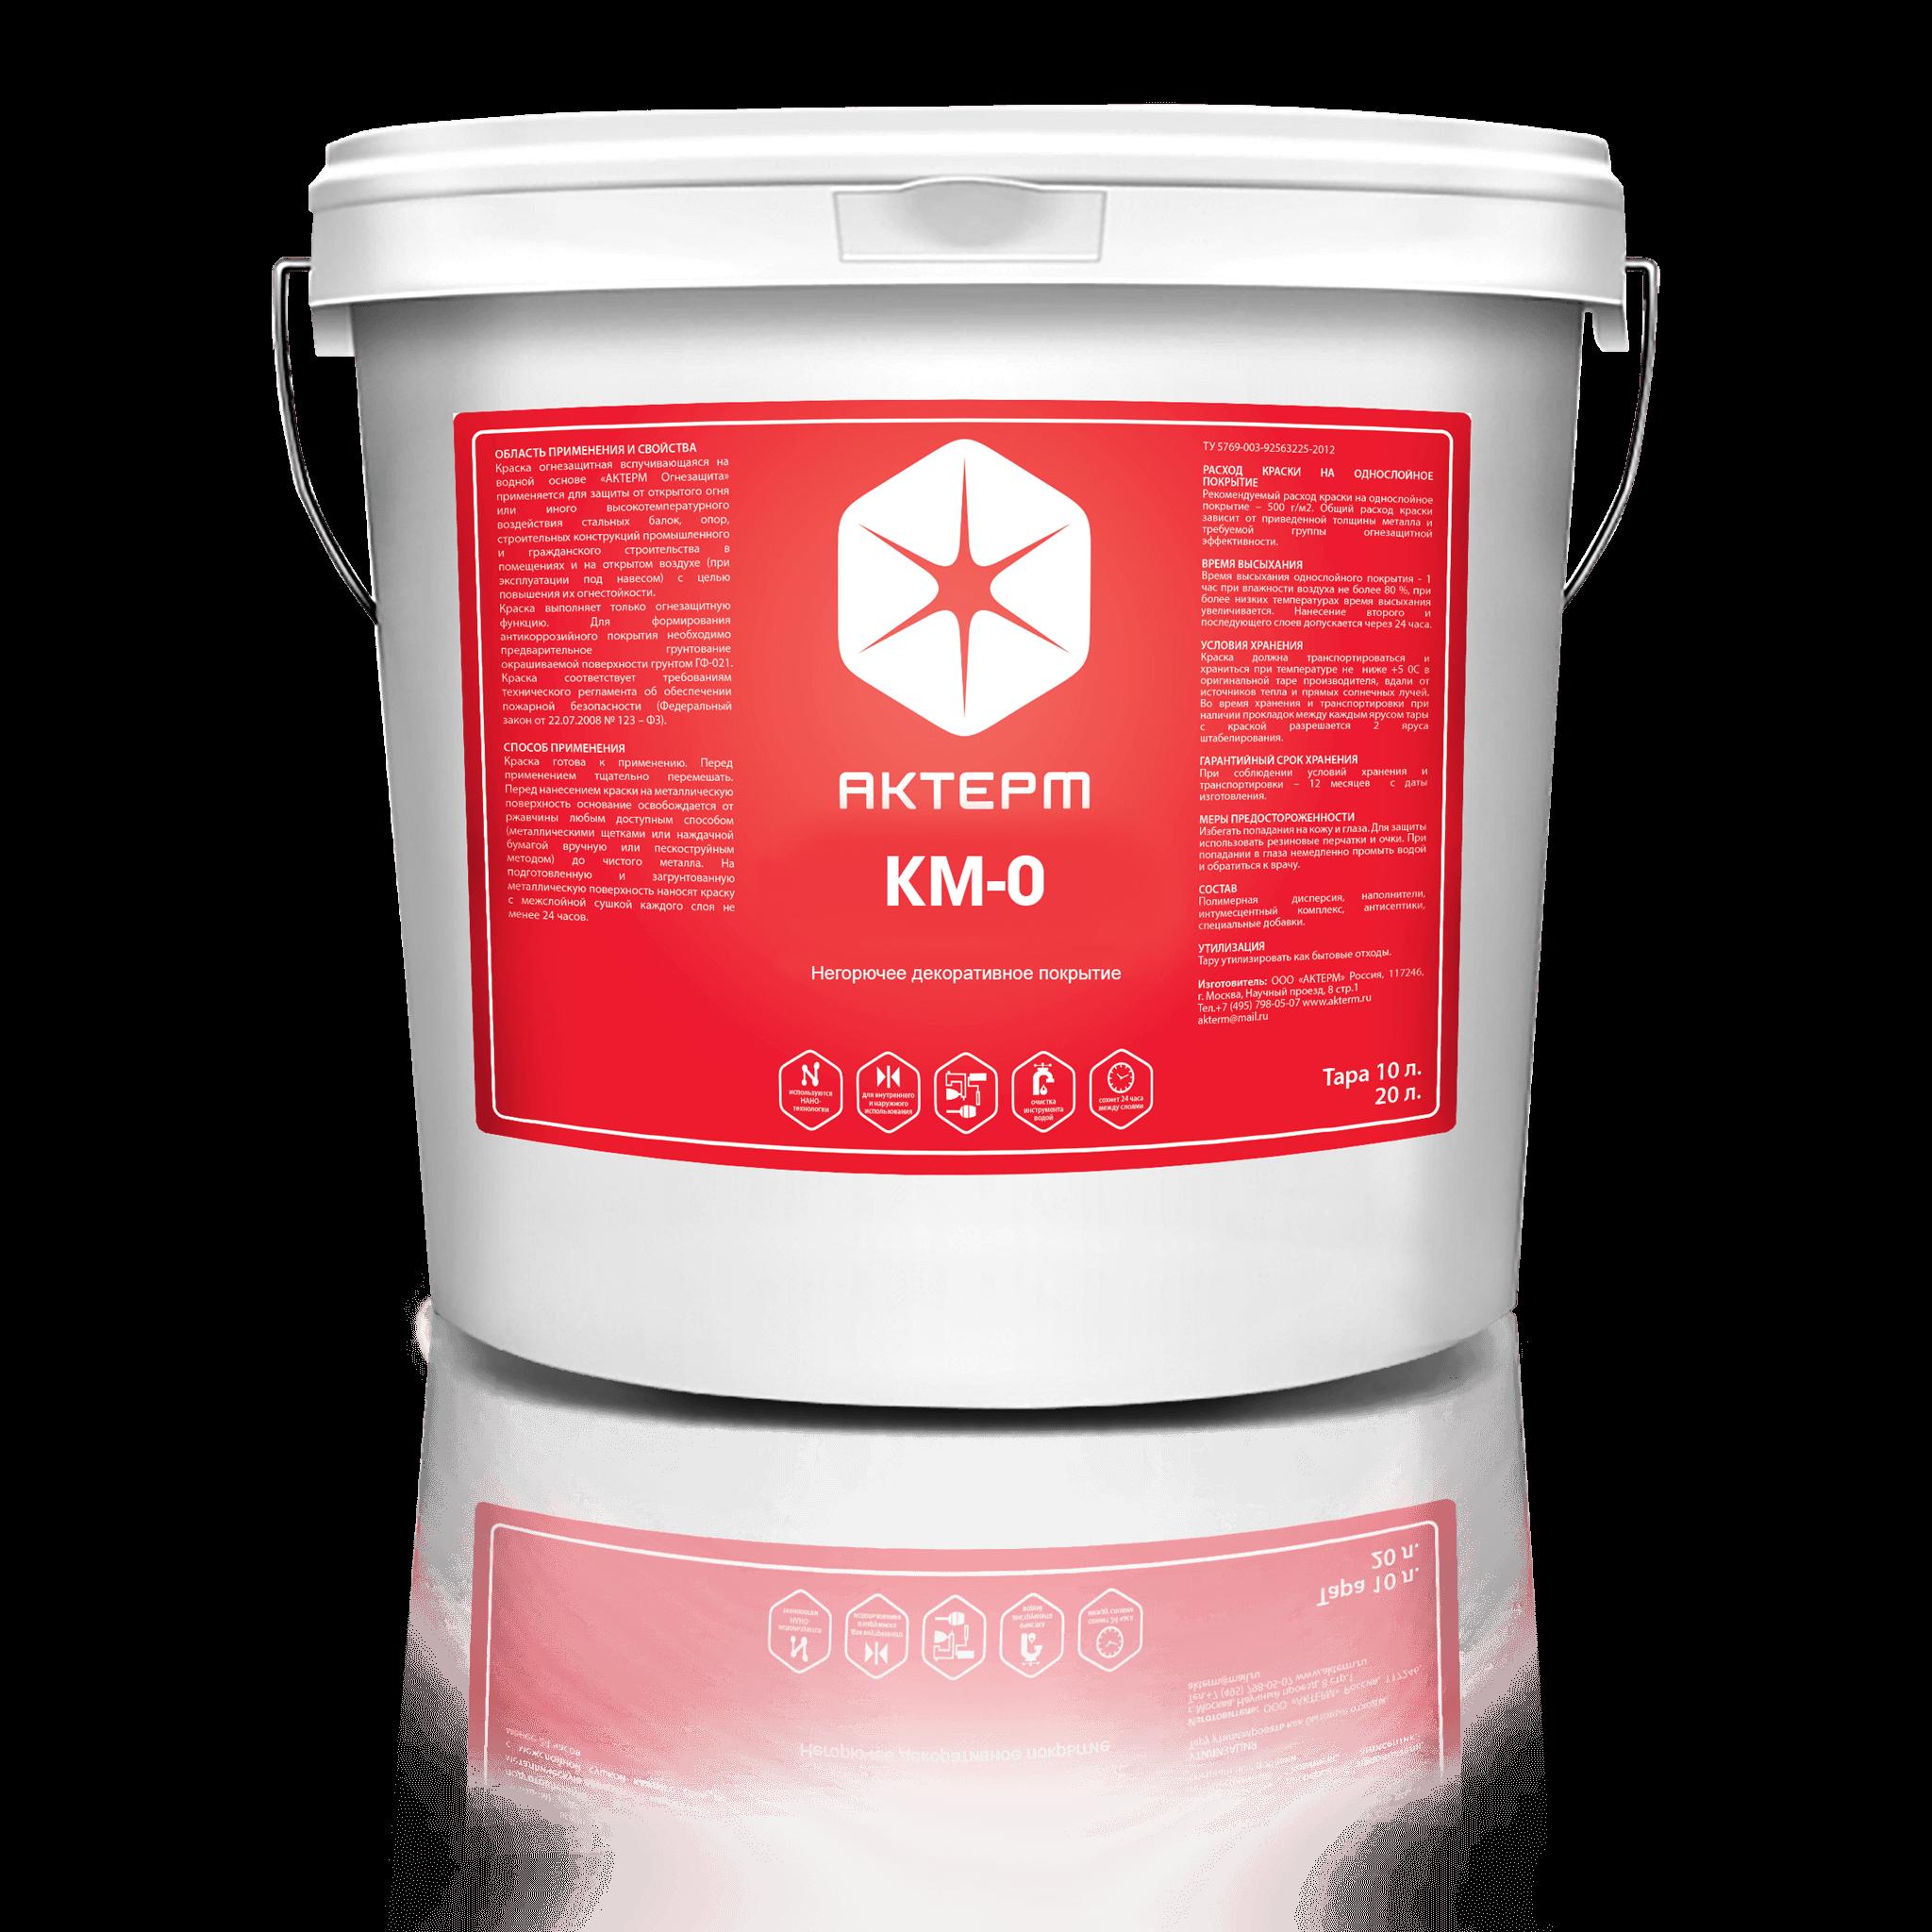 Жидкая теплоизоляция Актерм КМ0 (НГ)